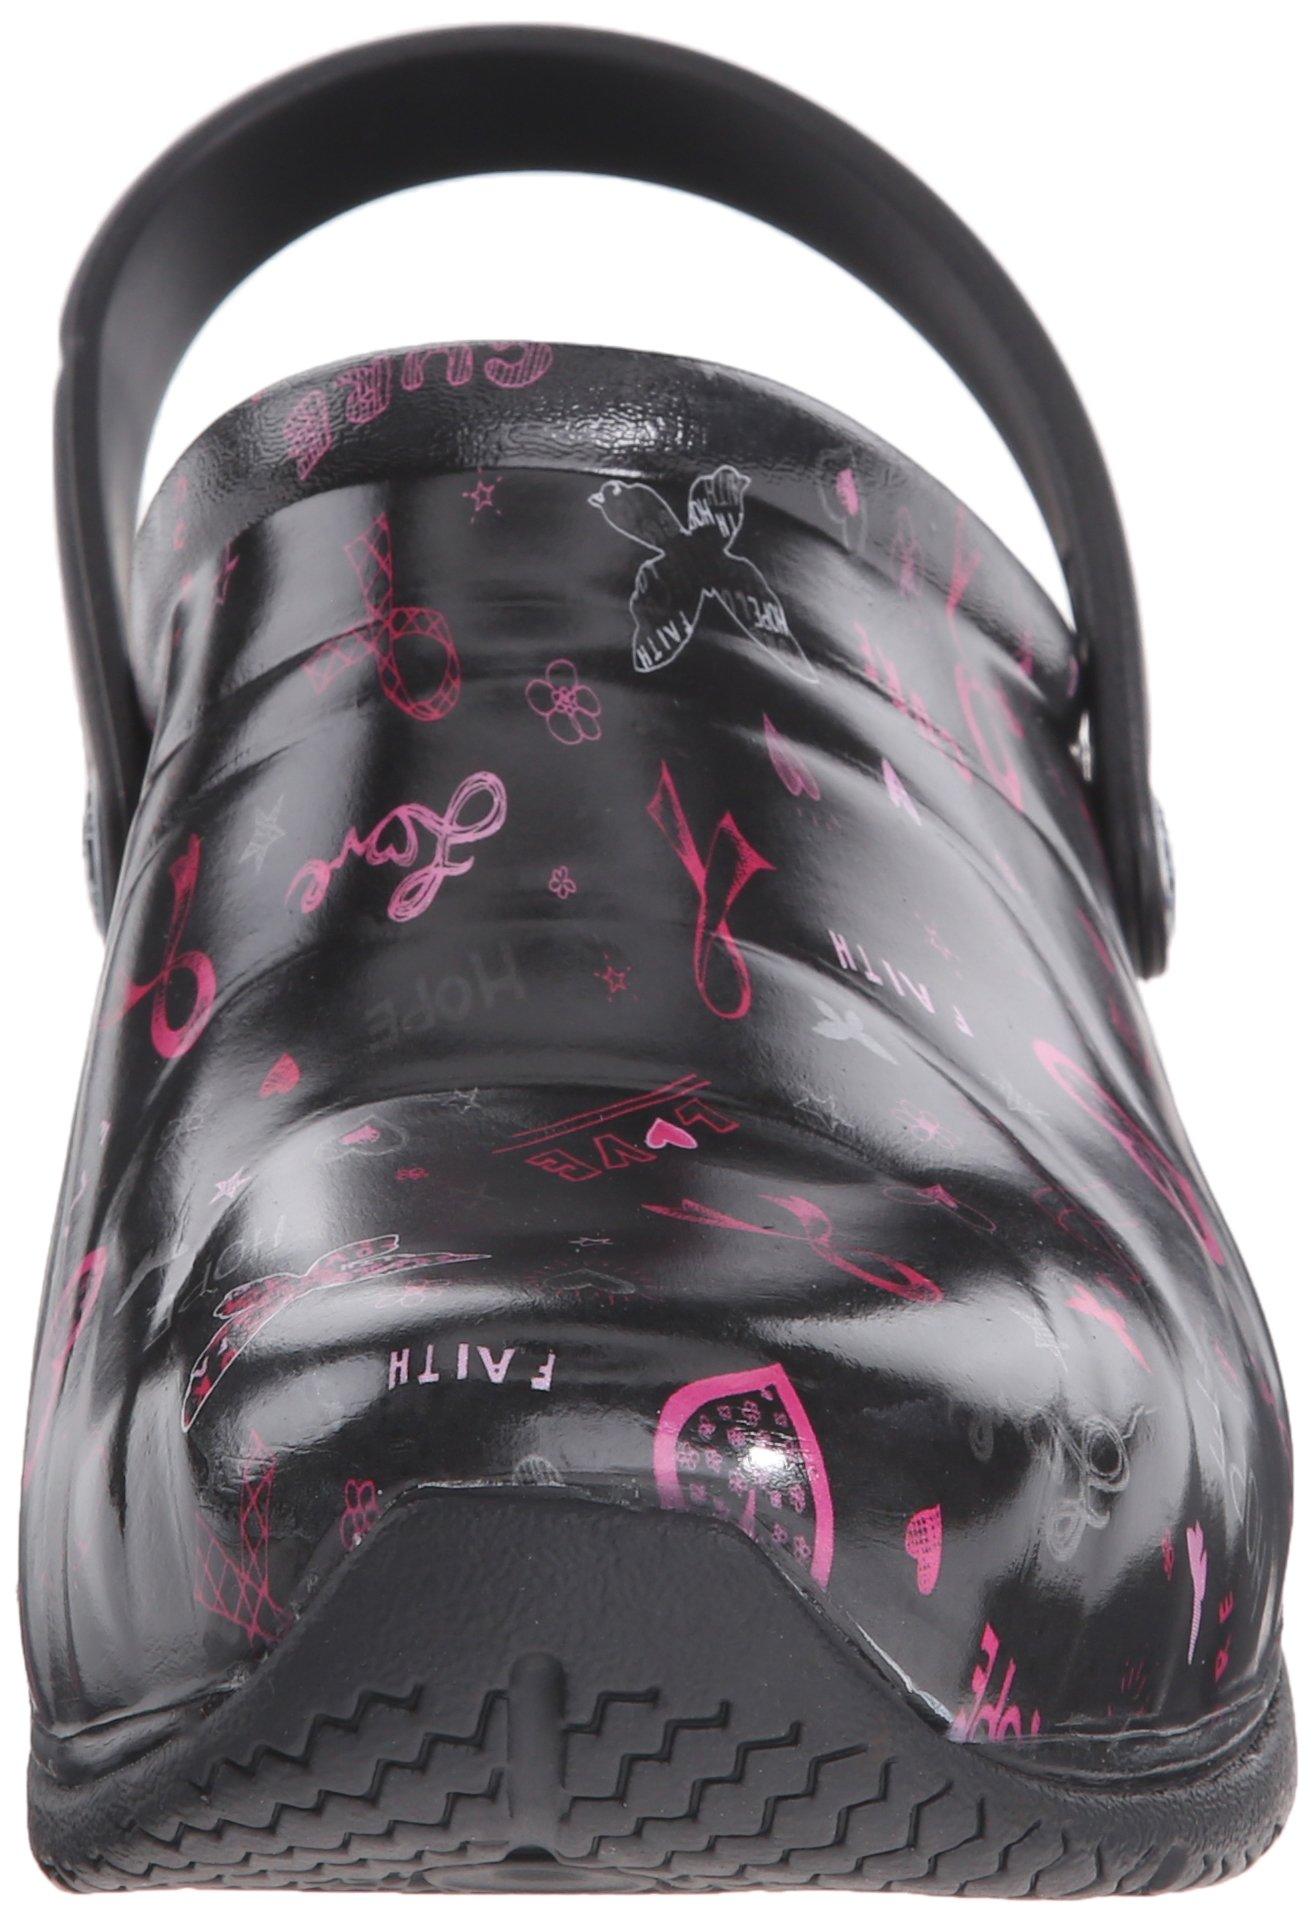 Anywear Women's Zone Work Shoe, Love Hope Cure/Pink Ribbon Print, 8 M US by Anywear (Image #4)